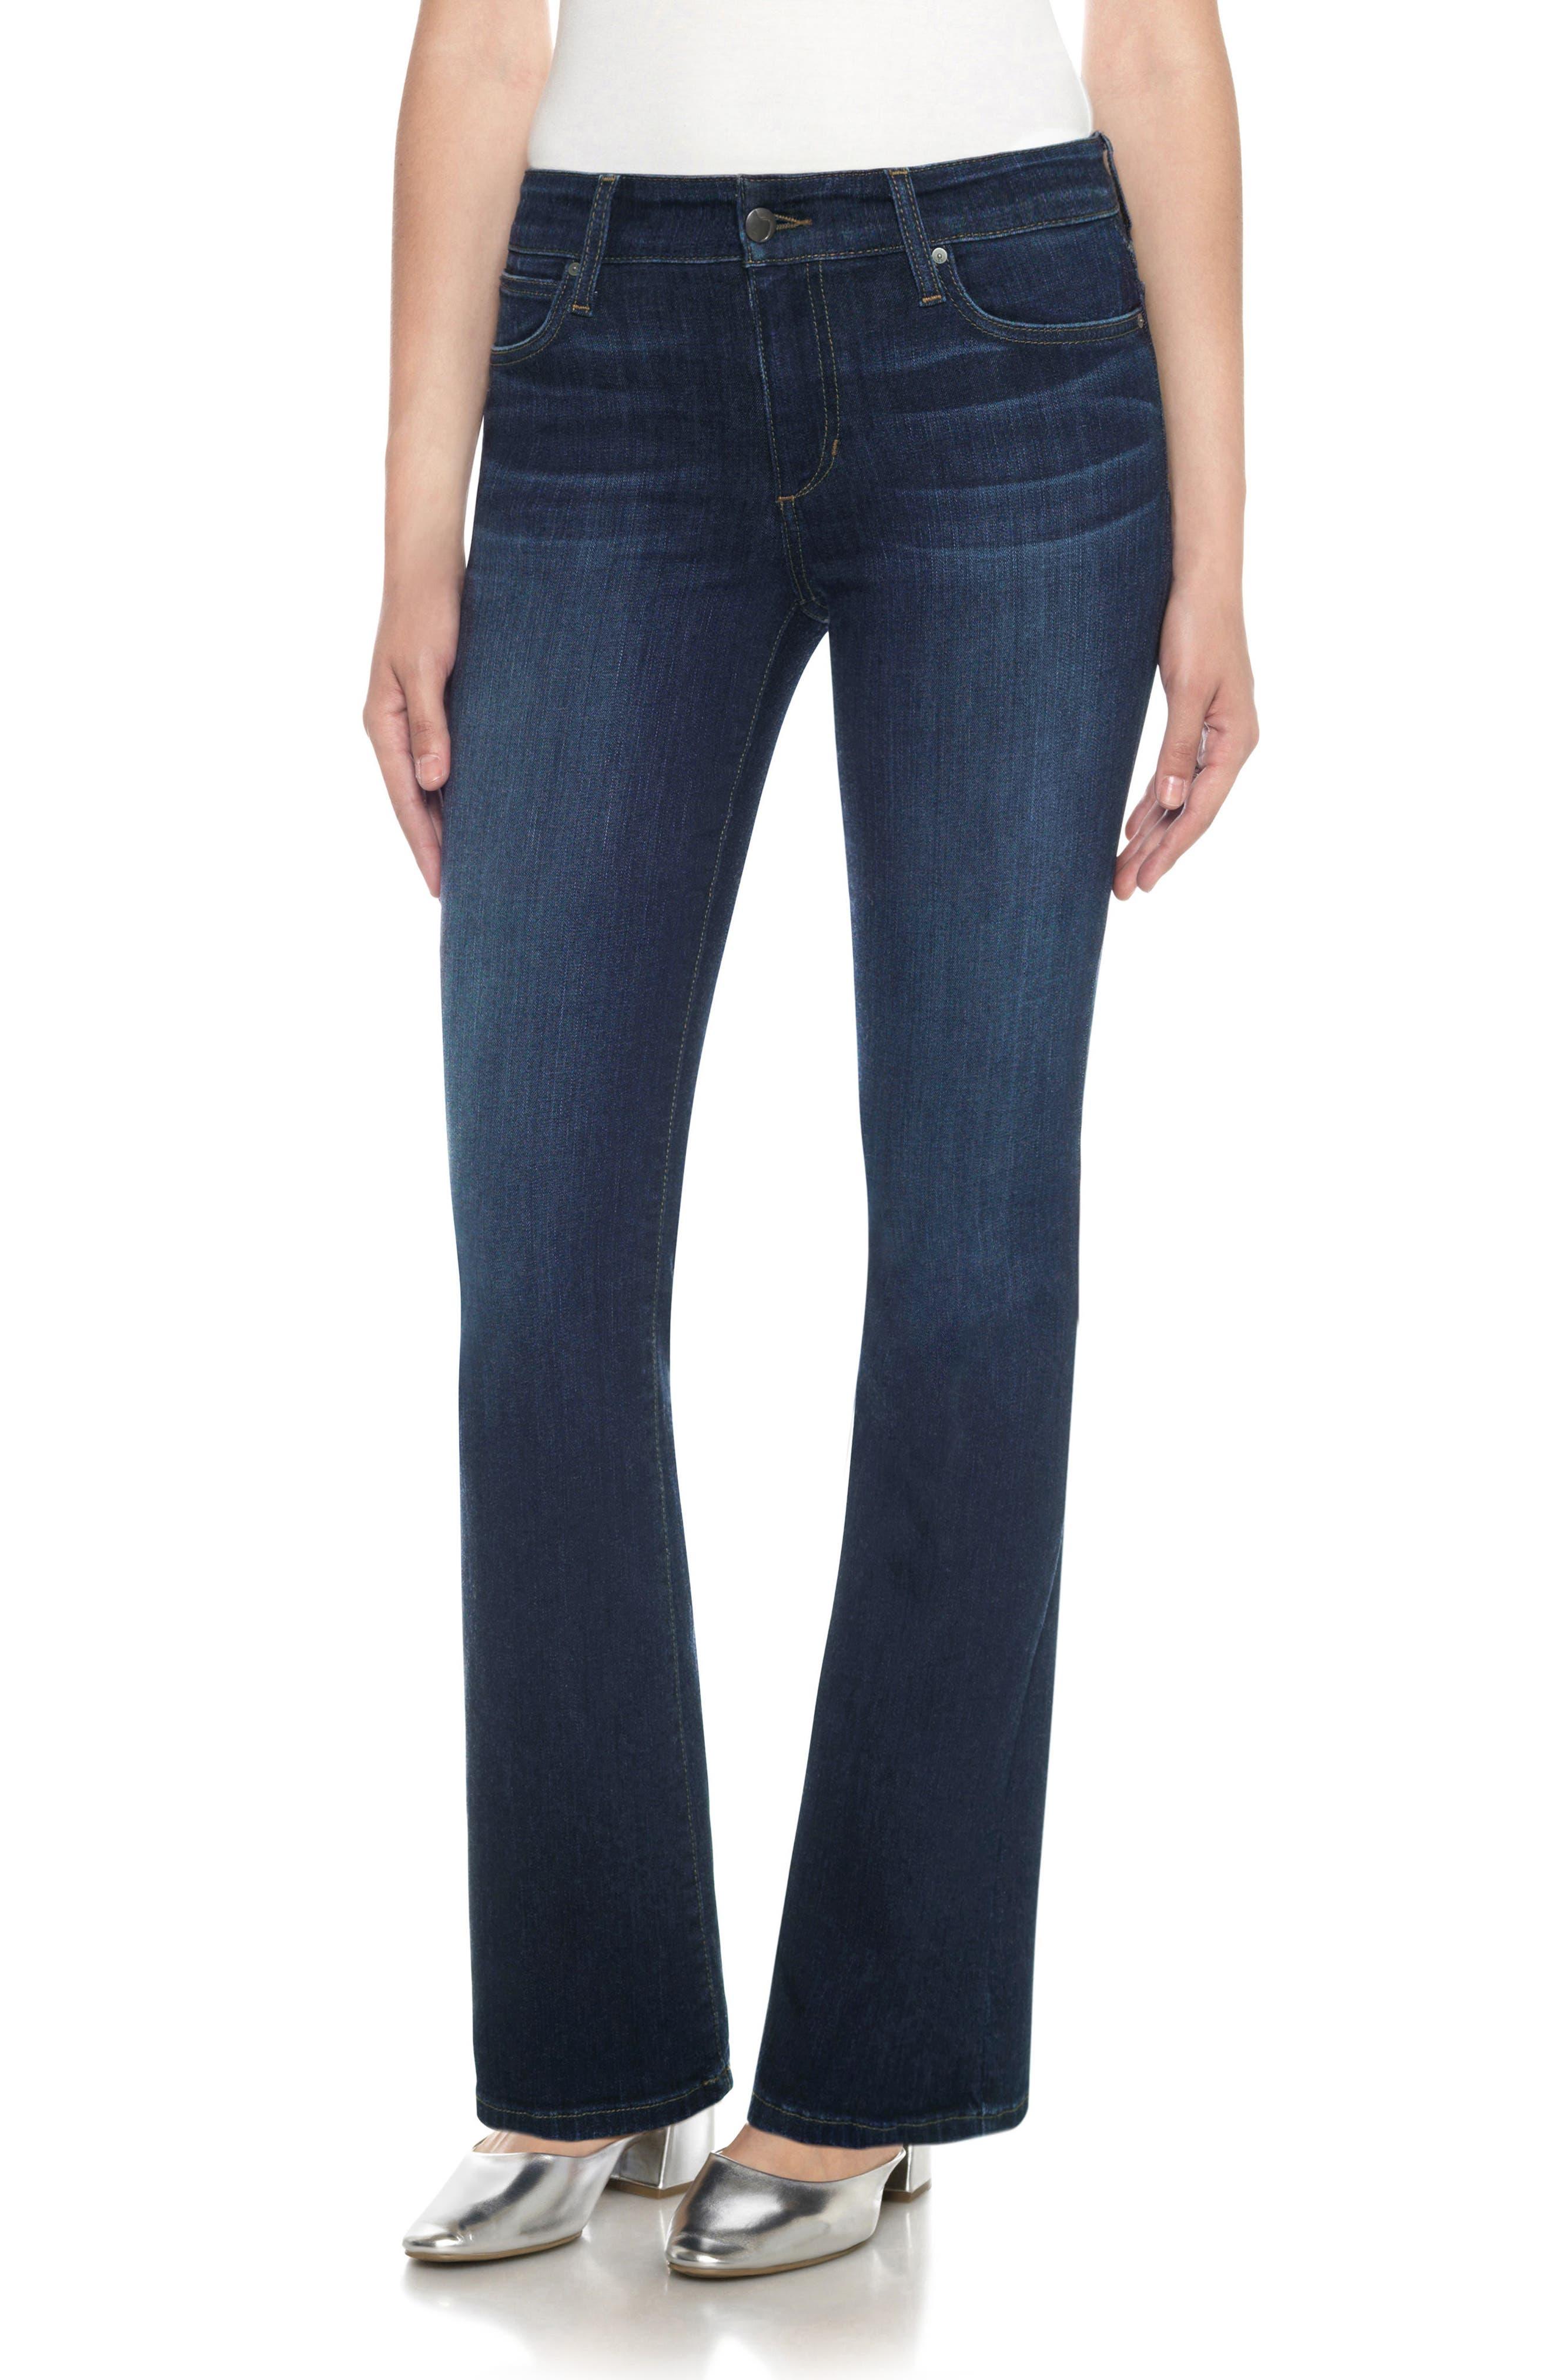 JOE'S, Flawless - Provocateur Bootcut Jeans, Main thumbnail 1, color, 401